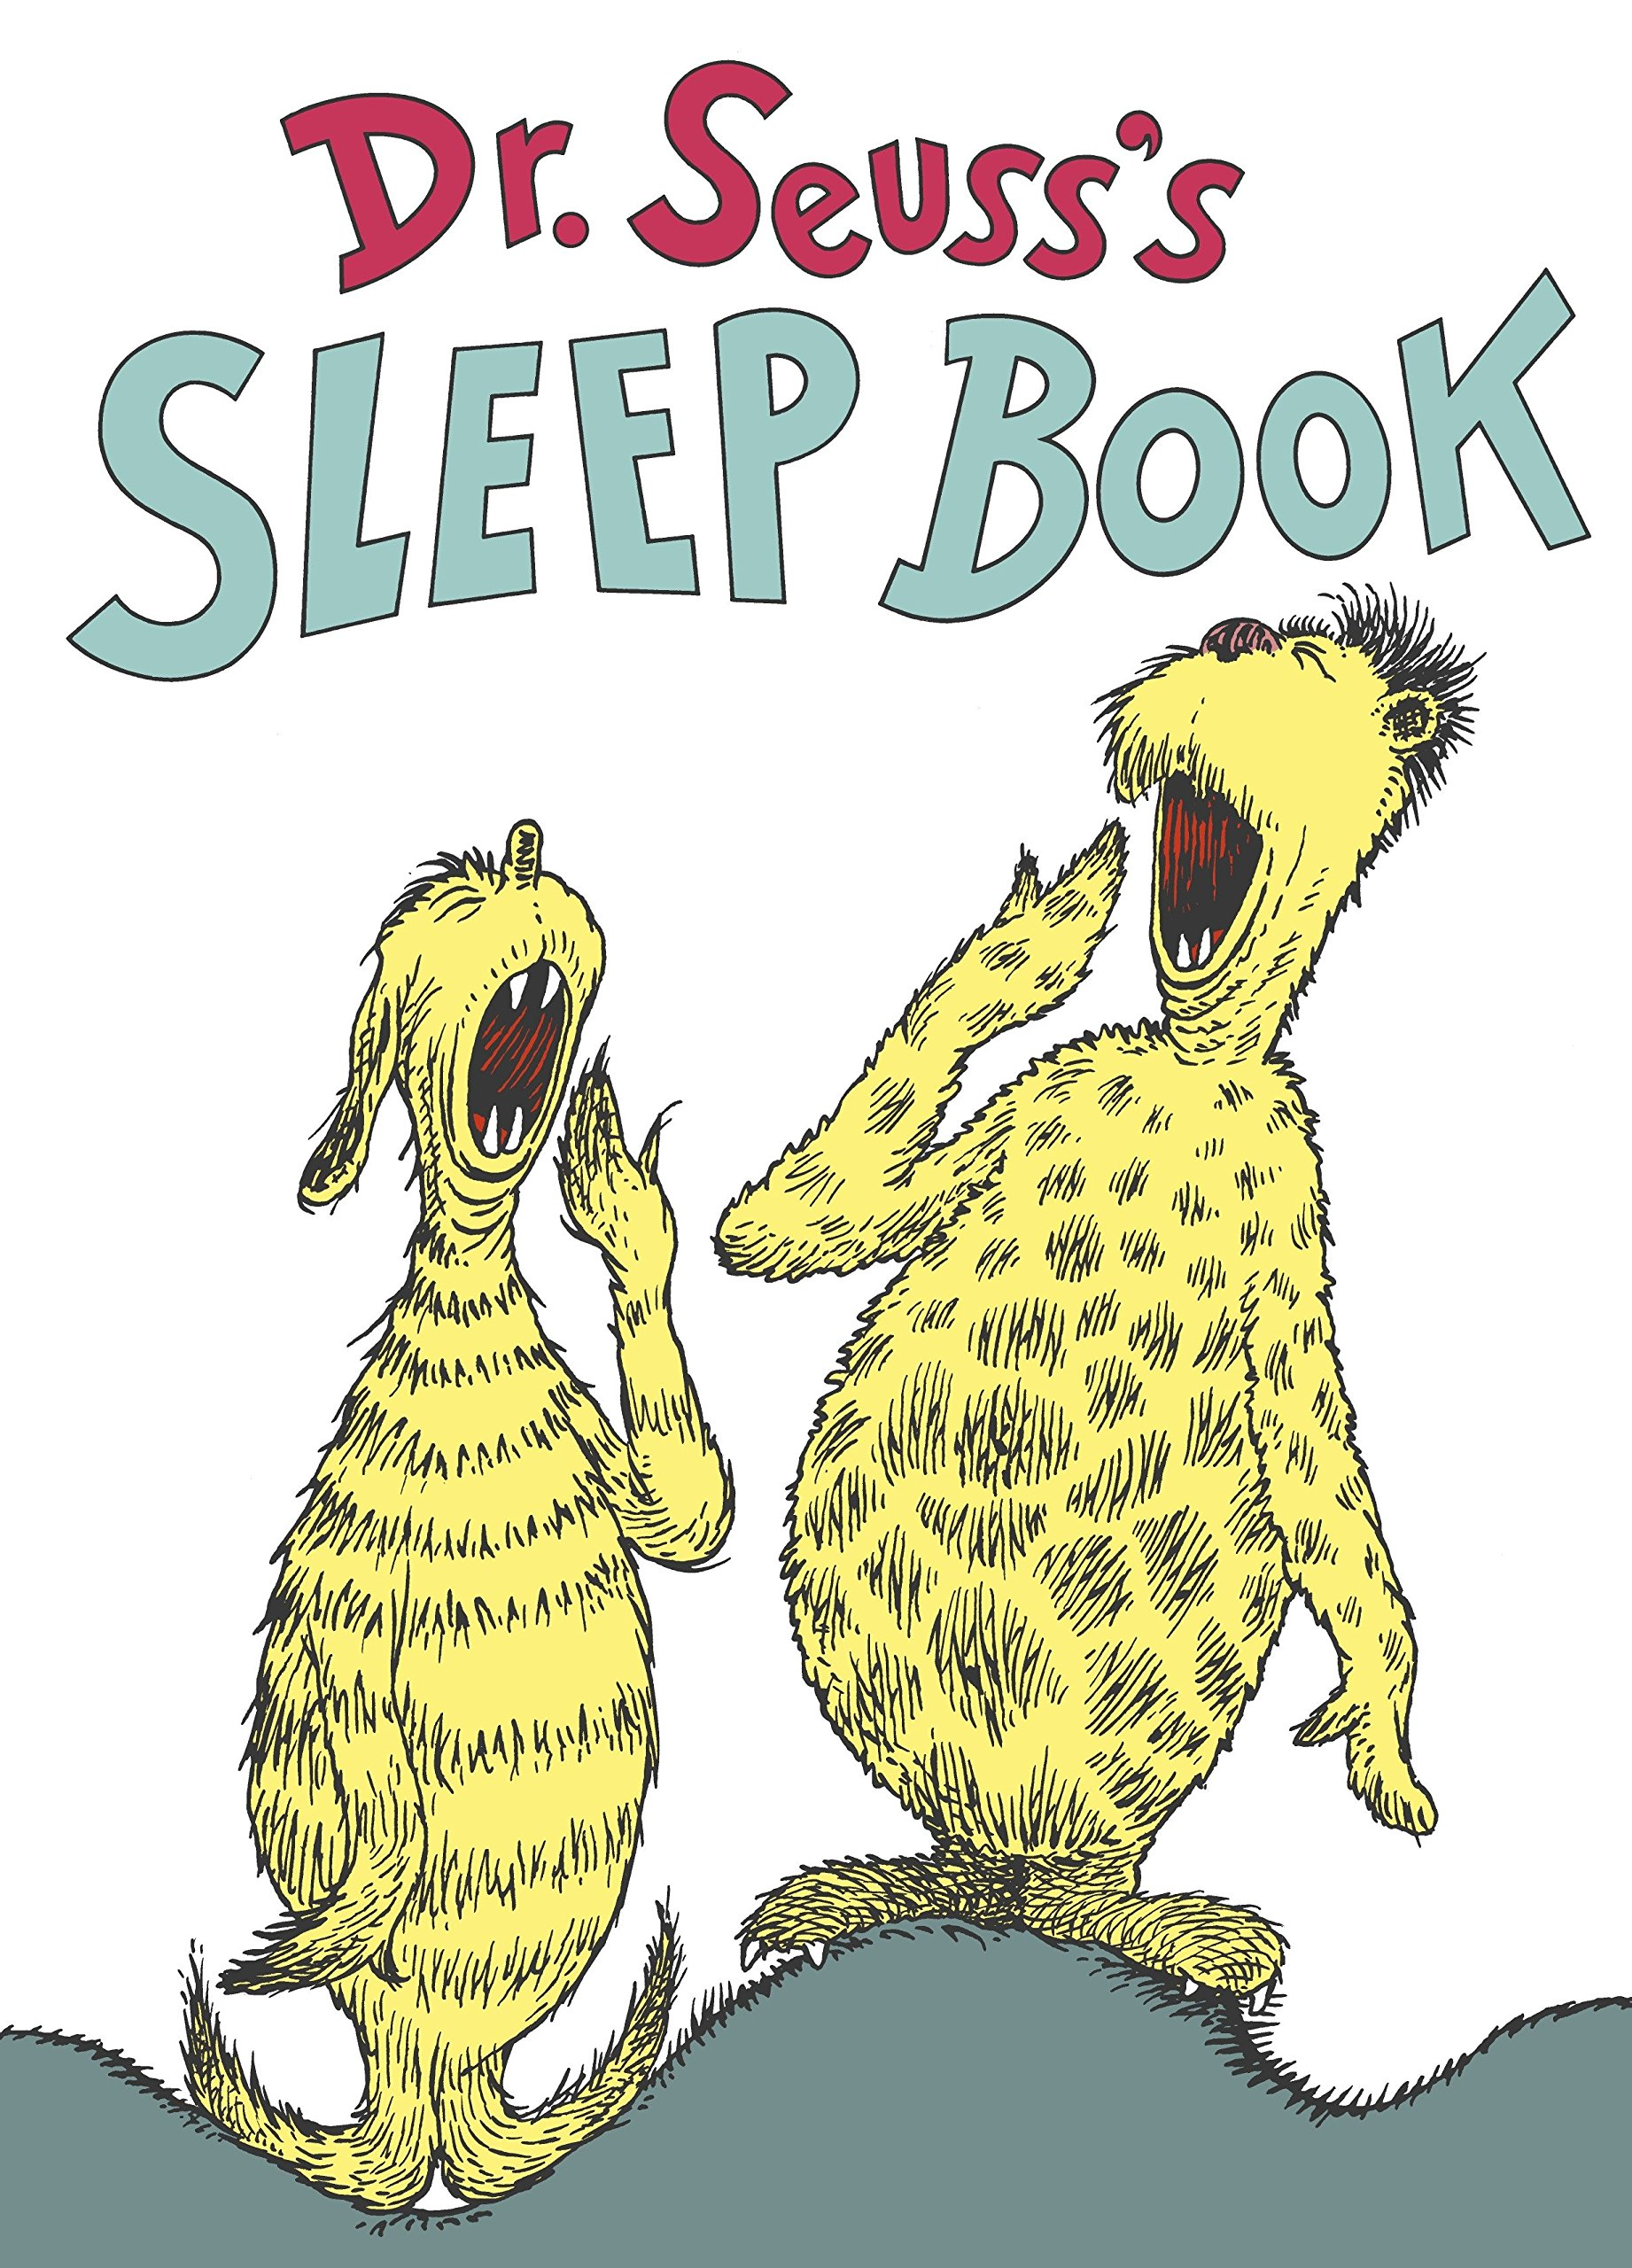 Amazon.com: Dr Seuss's Sleep Book (8601419644490): Dr. Seuss: Books